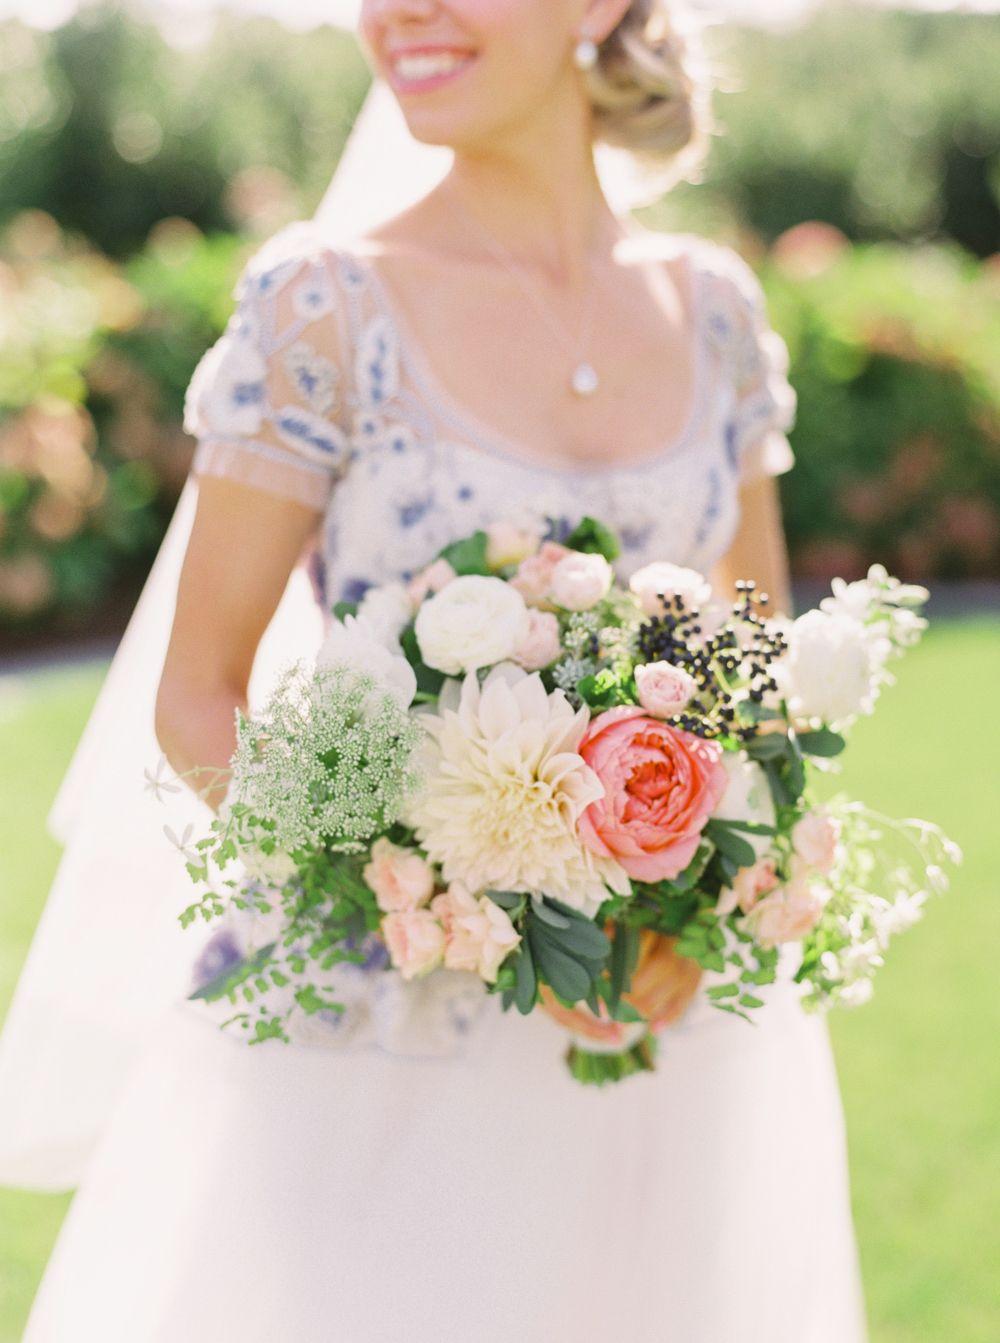 Elizabeth u tylerus elegant ocean house wedding in watch hill rhode